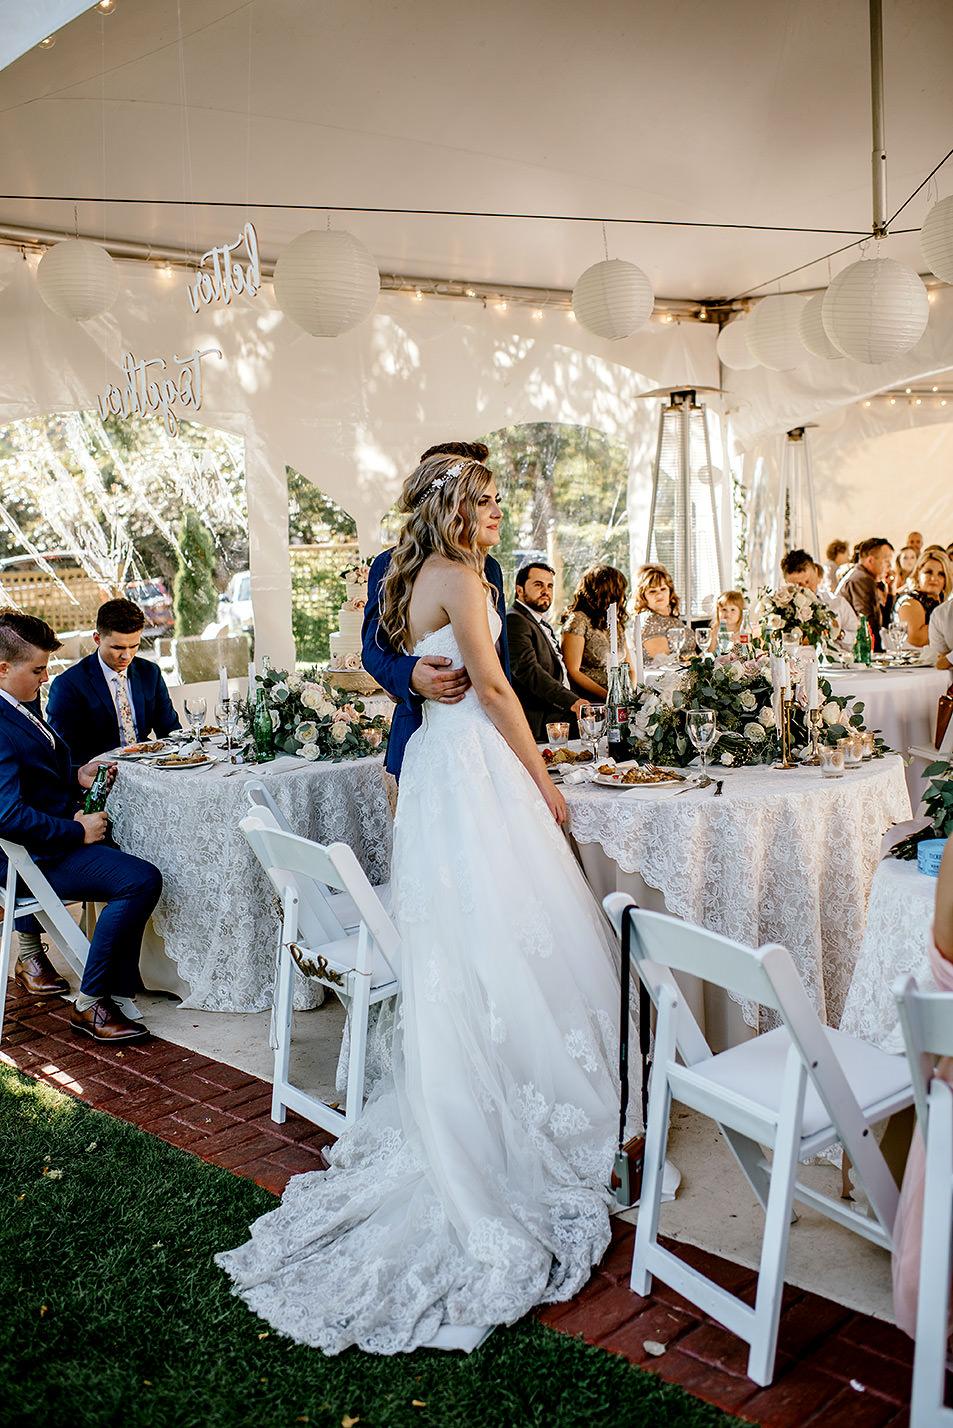 Lairmont_Manor_Wedding171.jpg